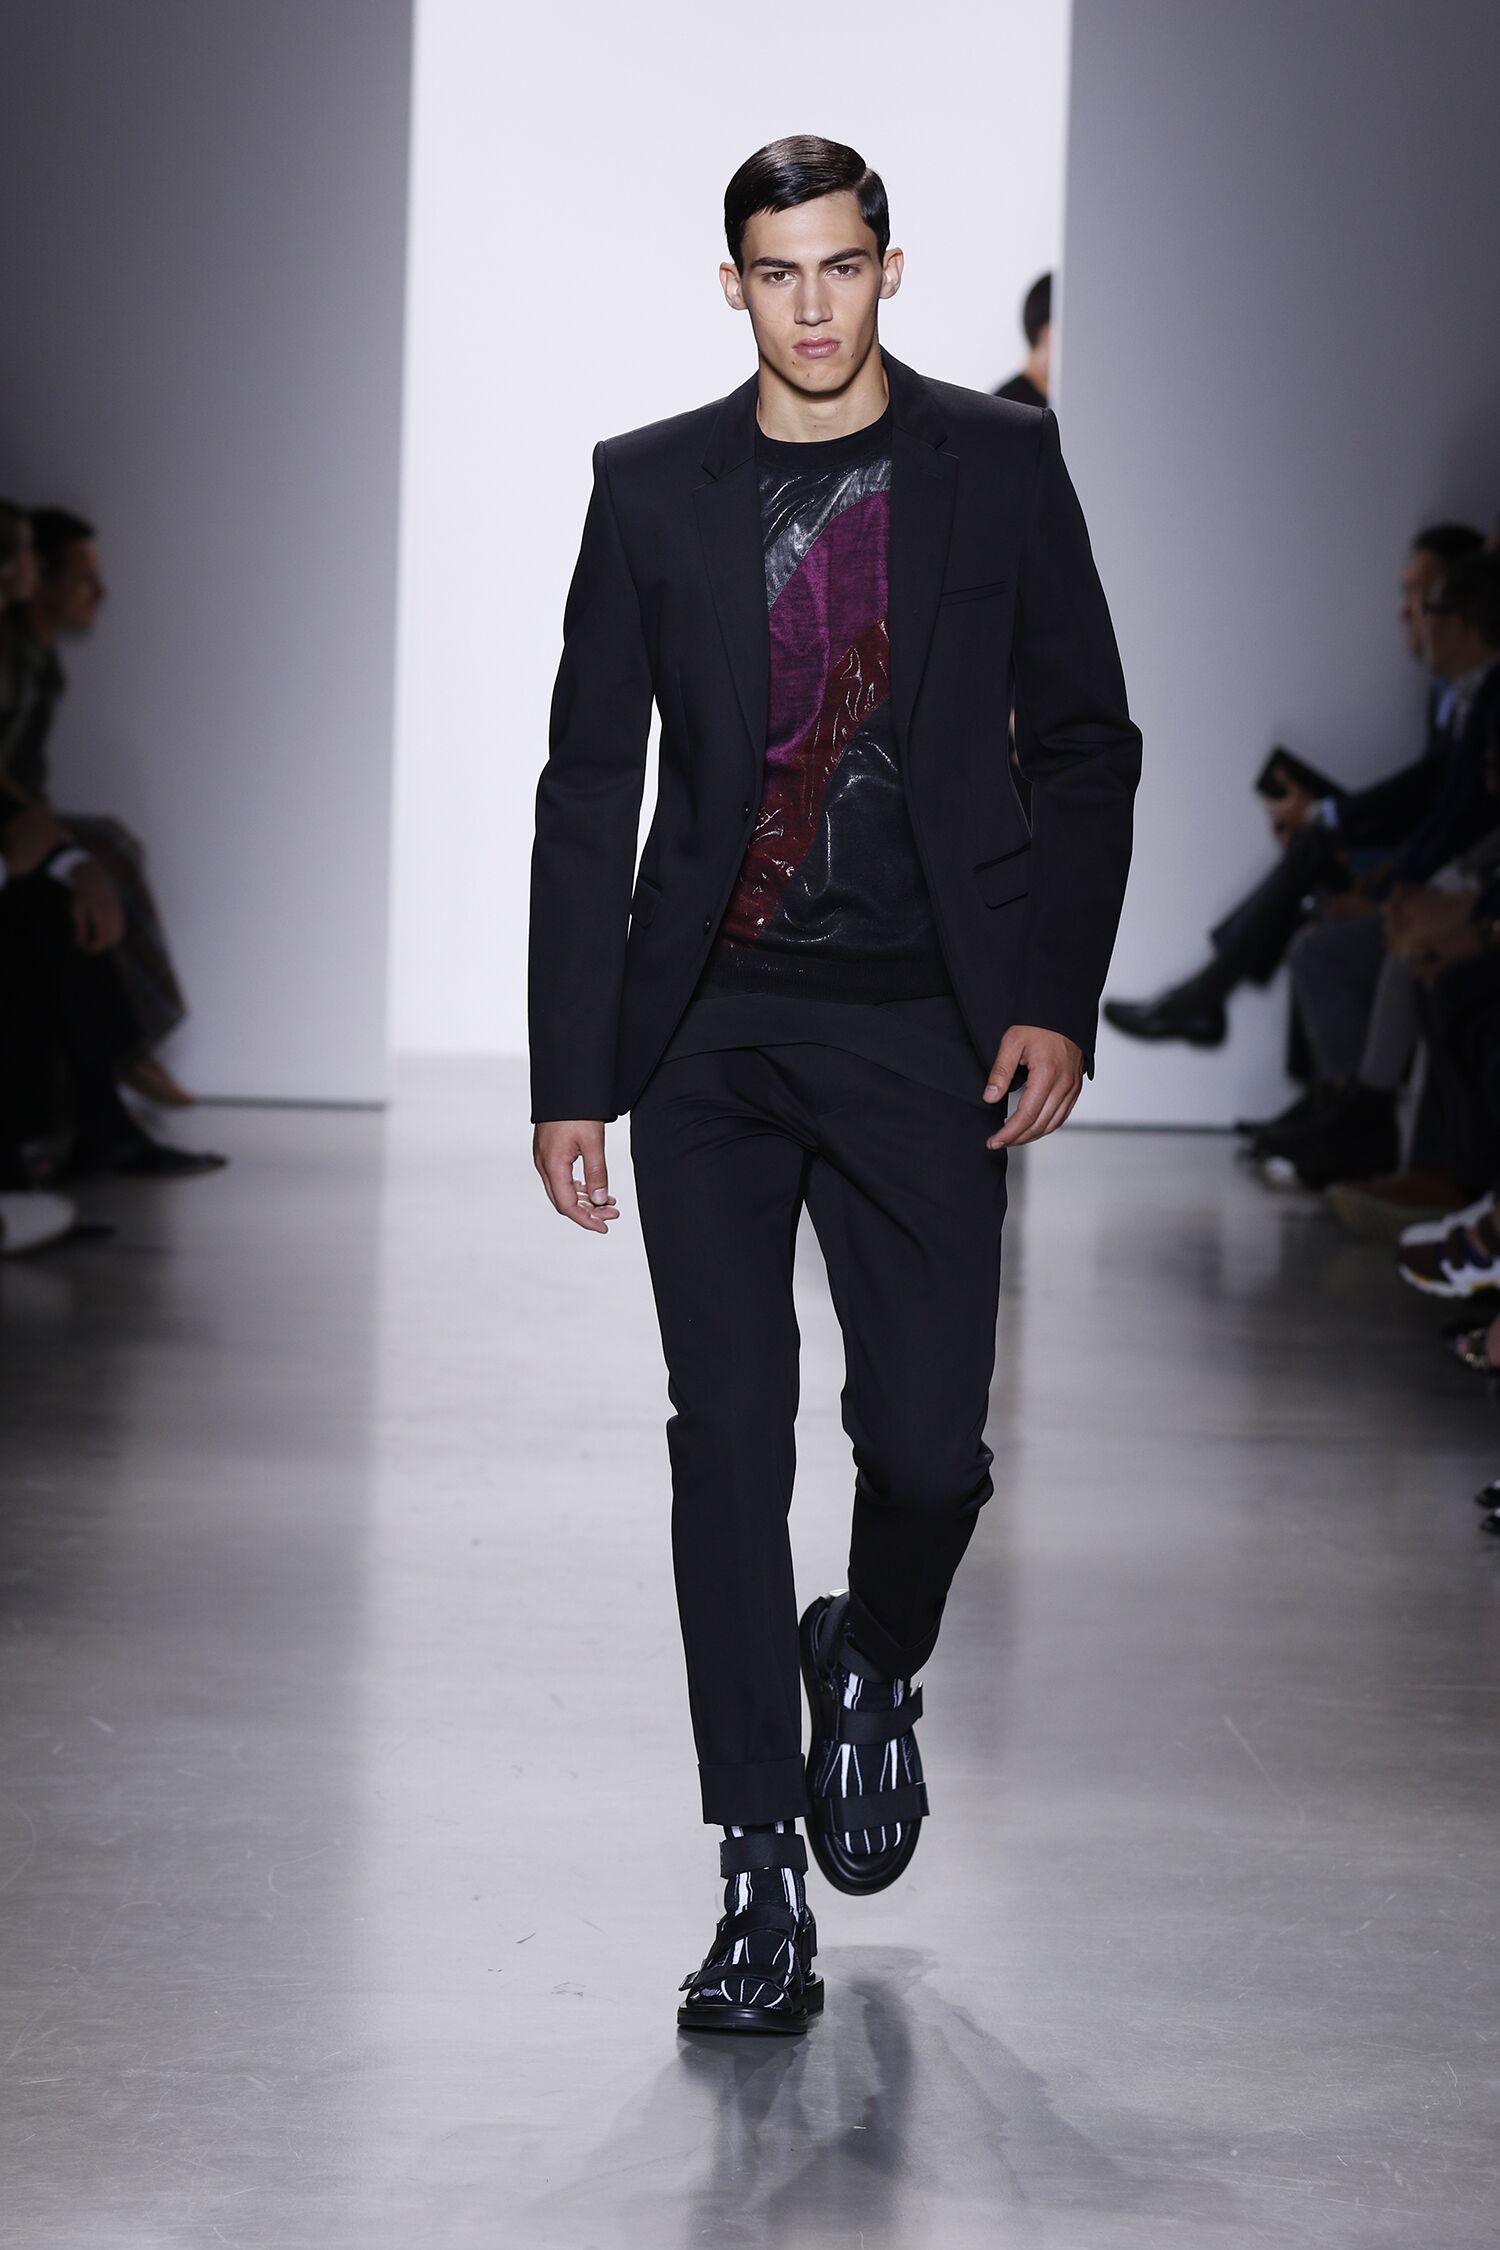 Summer 2016 Man Trends Calvin Klein Collection